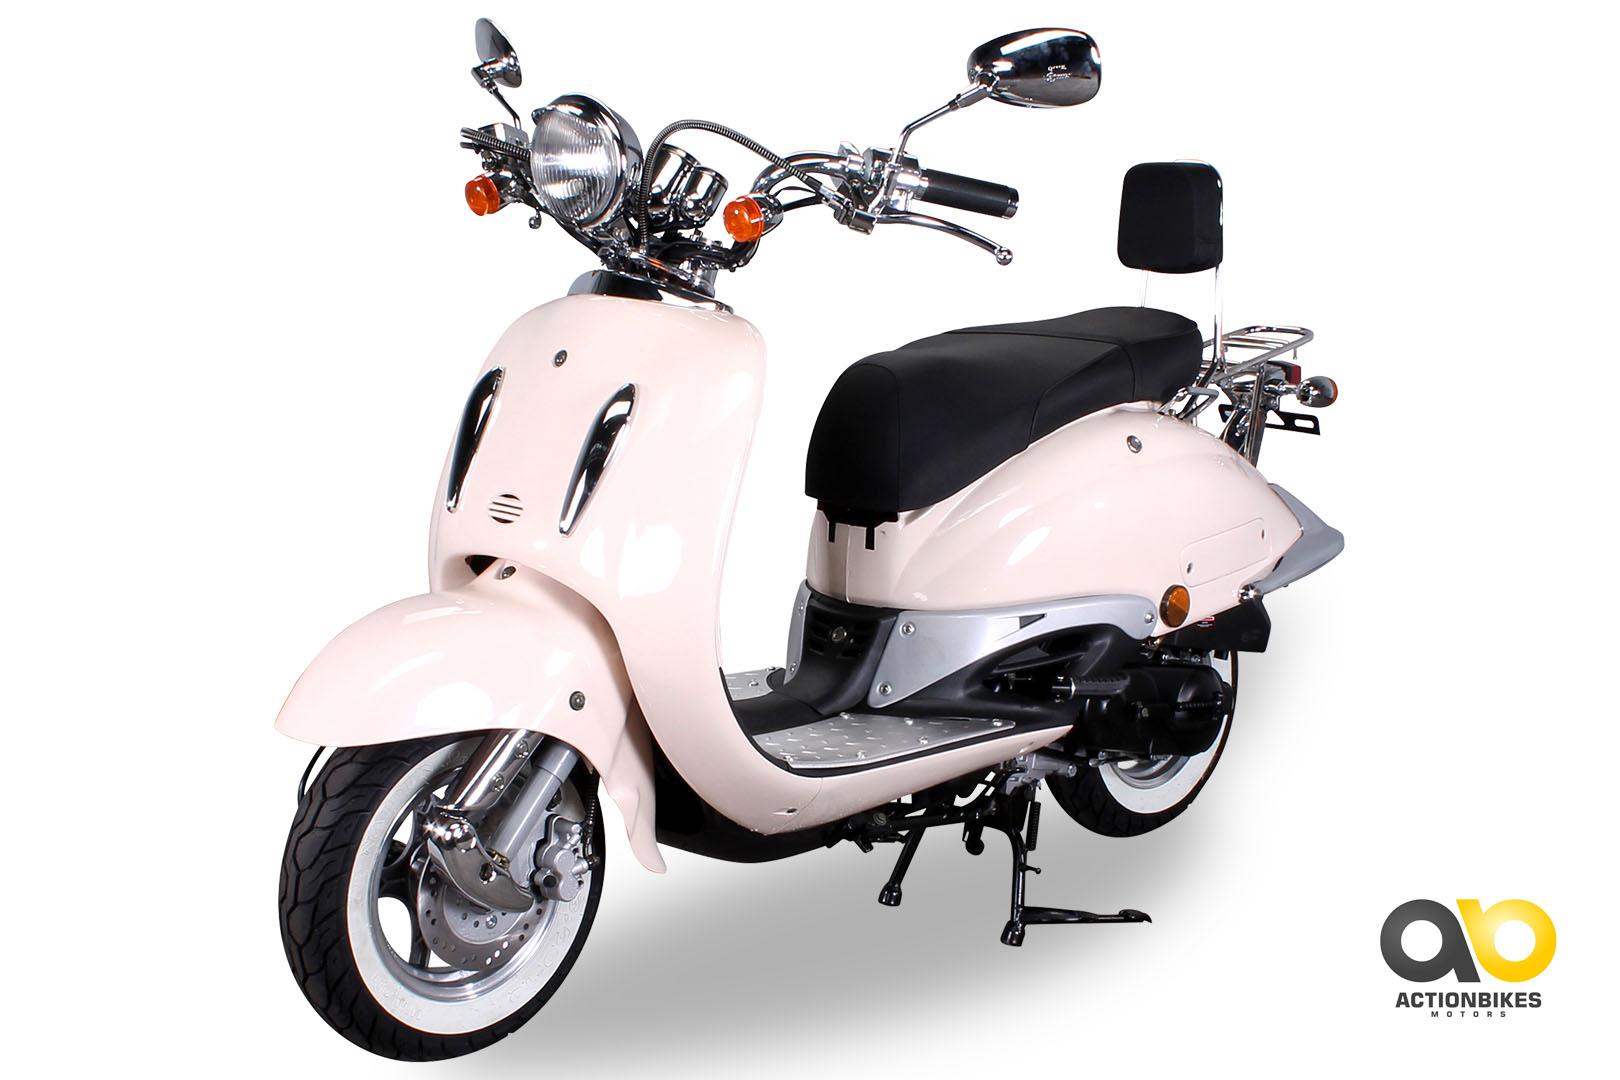 roller ab 125 cc roller zweir der actionbikes gmbh. Black Bedroom Furniture Sets. Home Design Ideas